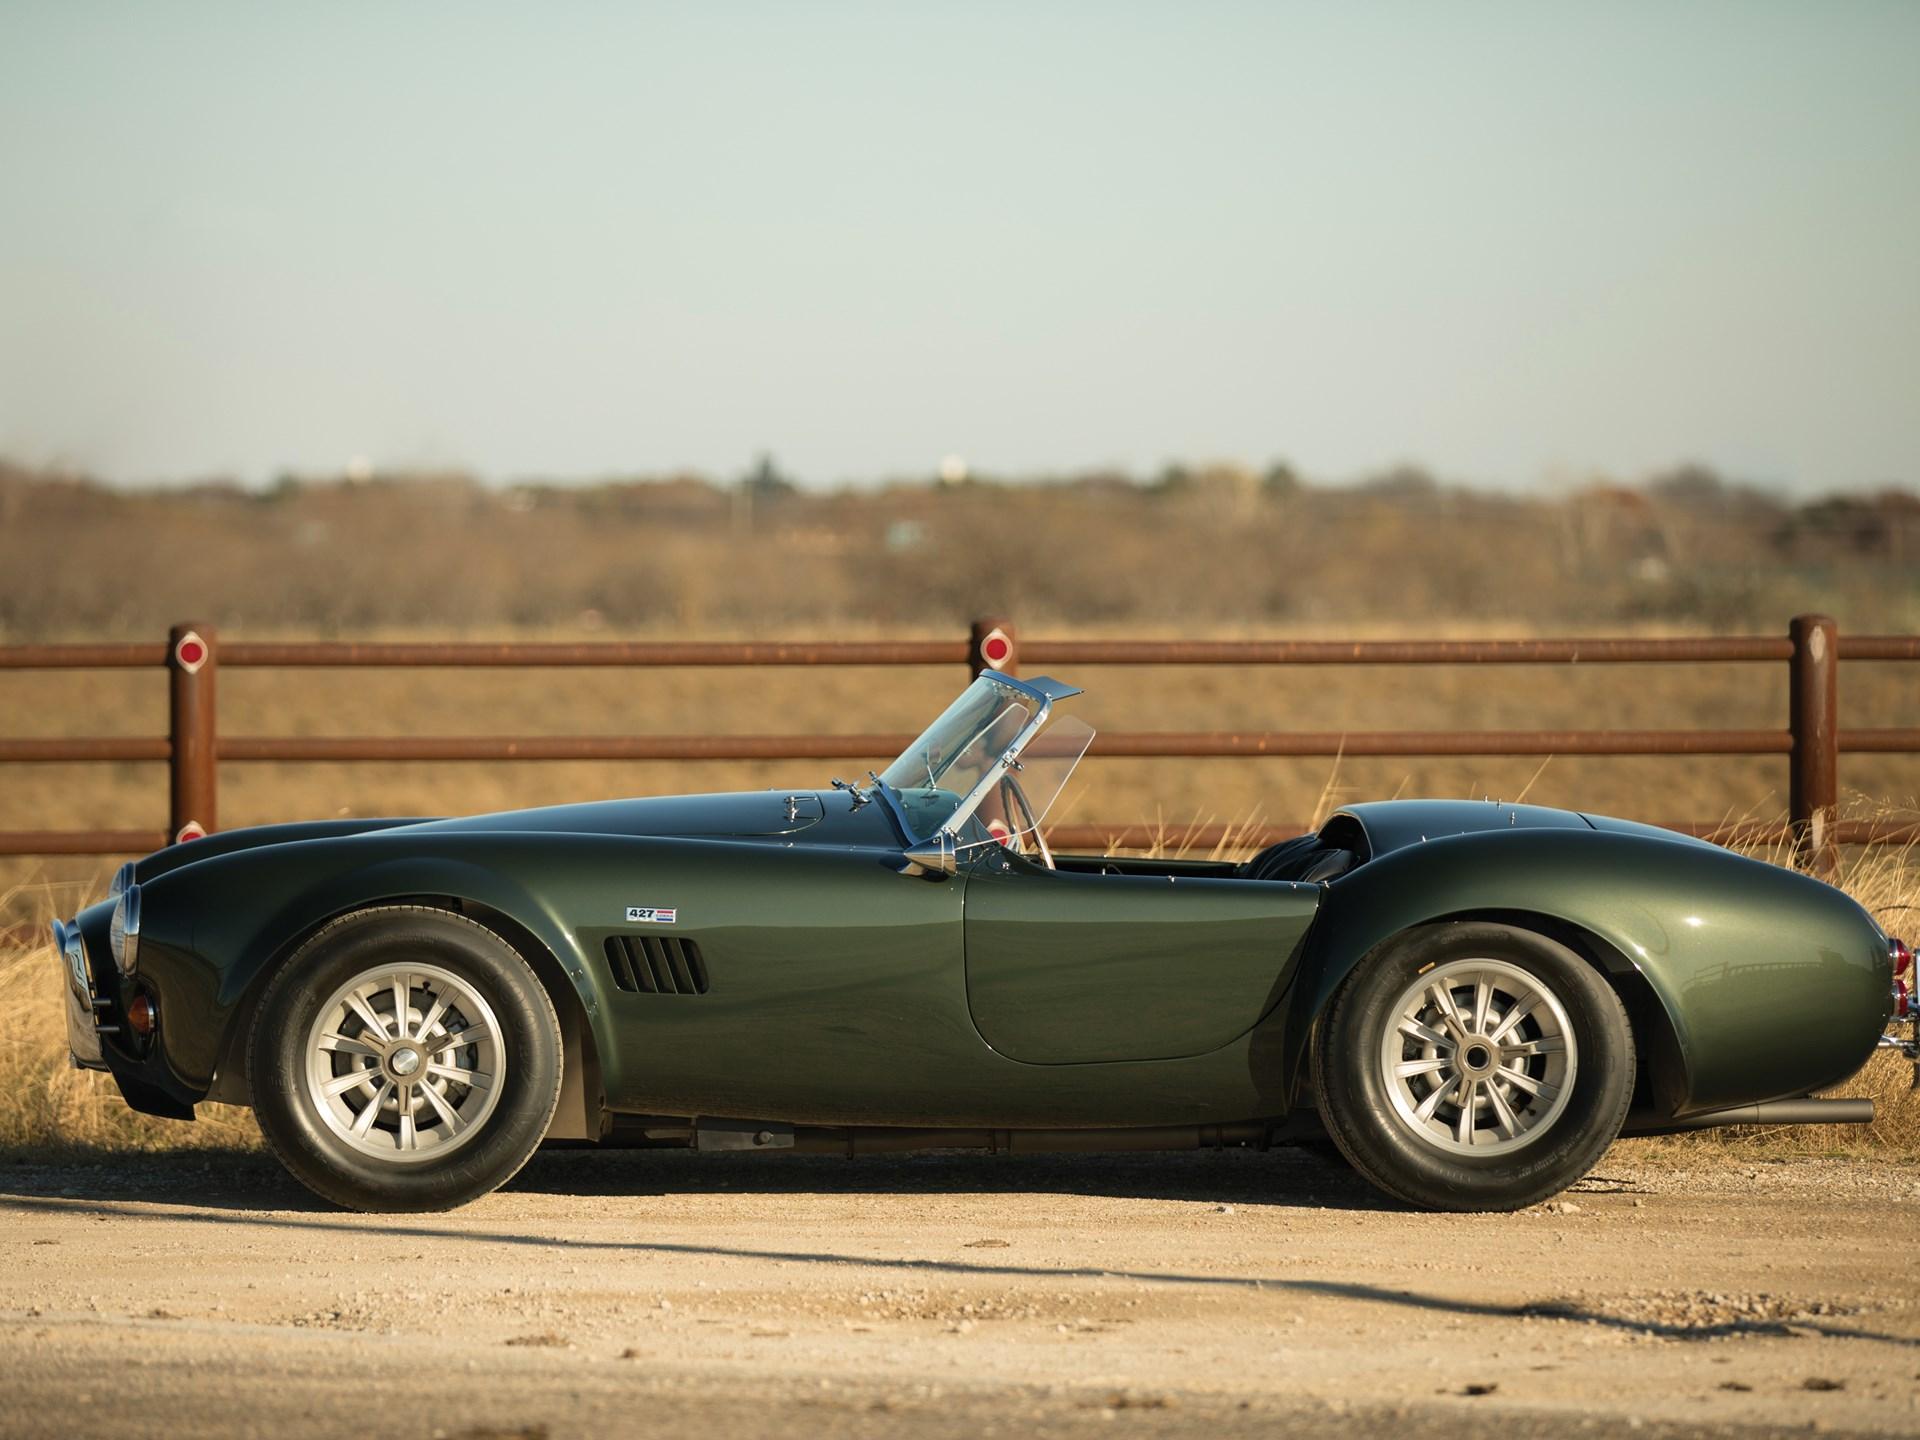 1967 Shelby 427 Cobra side profile